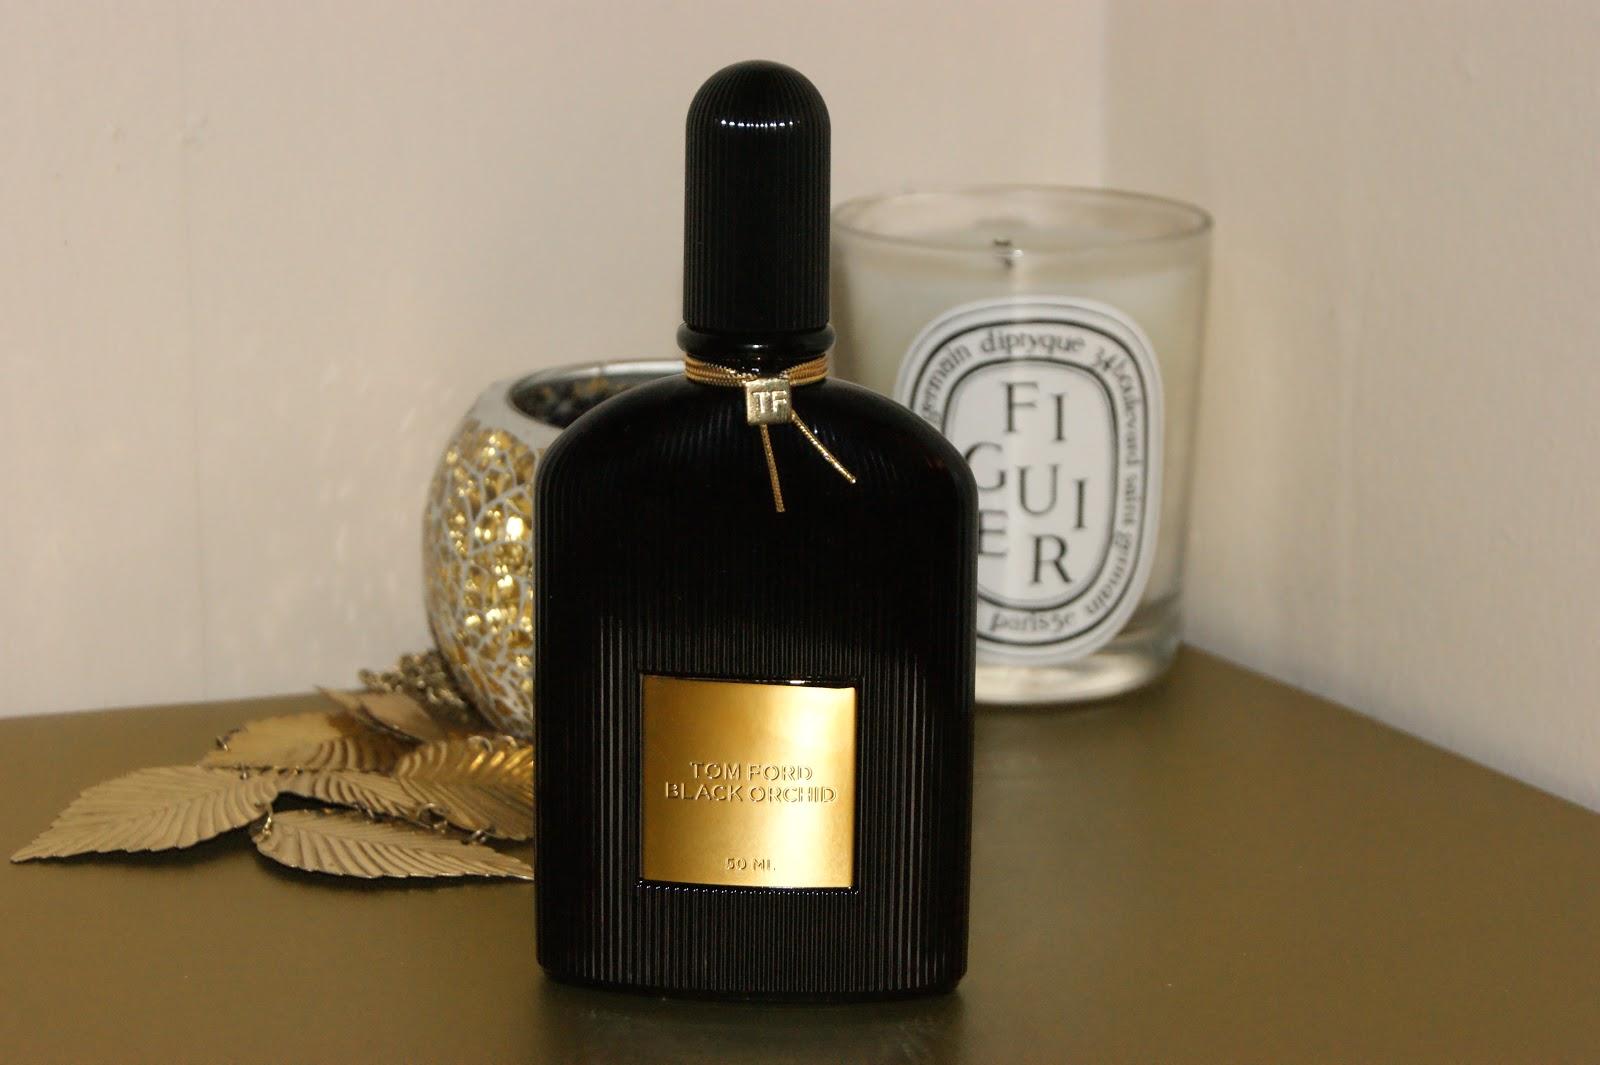 tom ford black orchid eau de parfum review the sunday girl. Black Bedroom Furniture Sets. Home Design Ideas